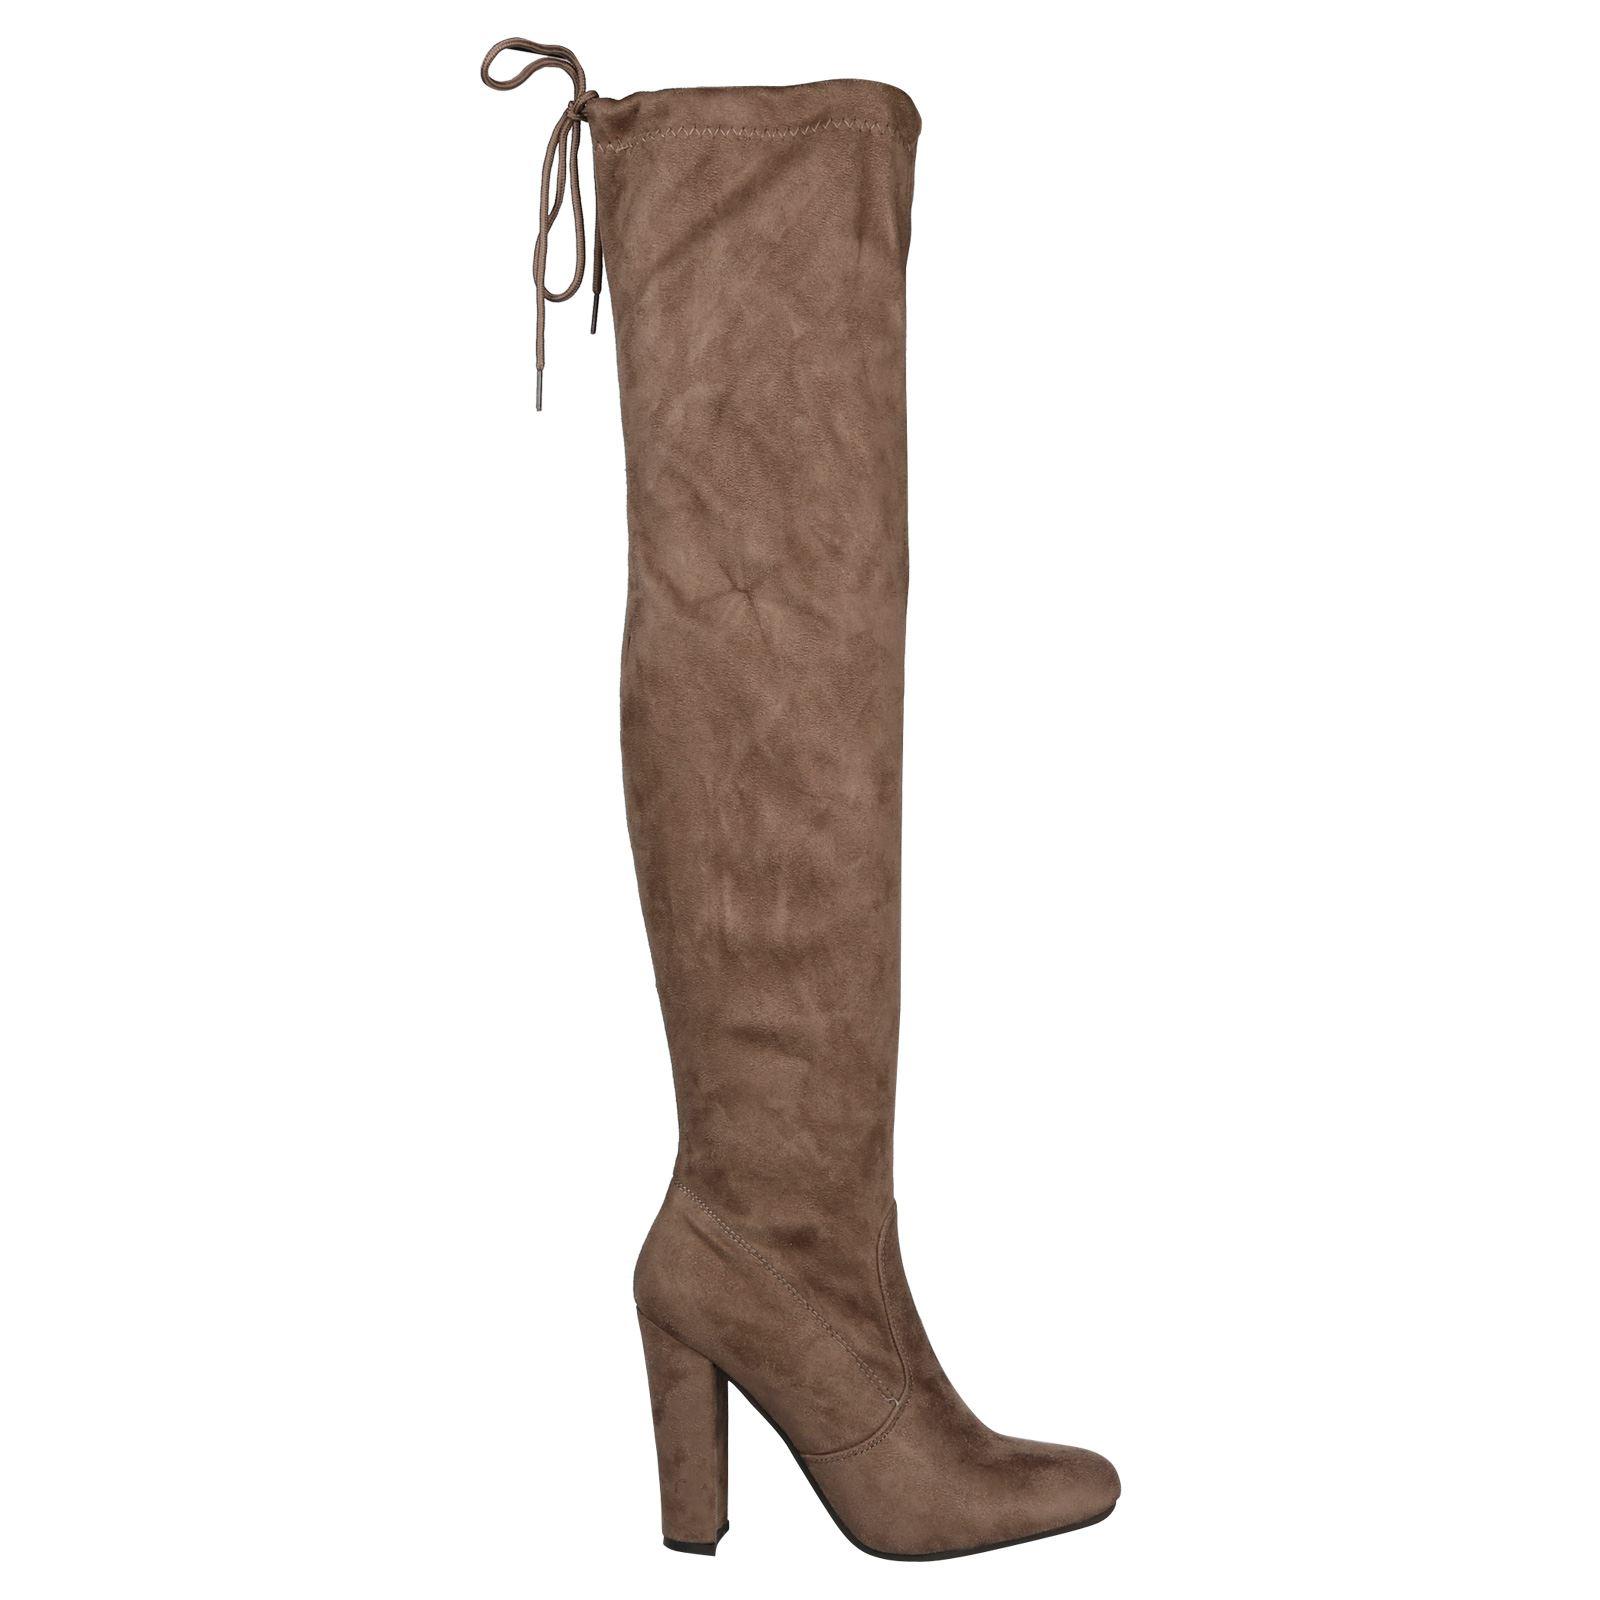 Iliana-Womens-Knee-High-Zip-Up-Adjustable-Pull-Strings-Mid-High-Block-Heel-Boots thumbnail 7